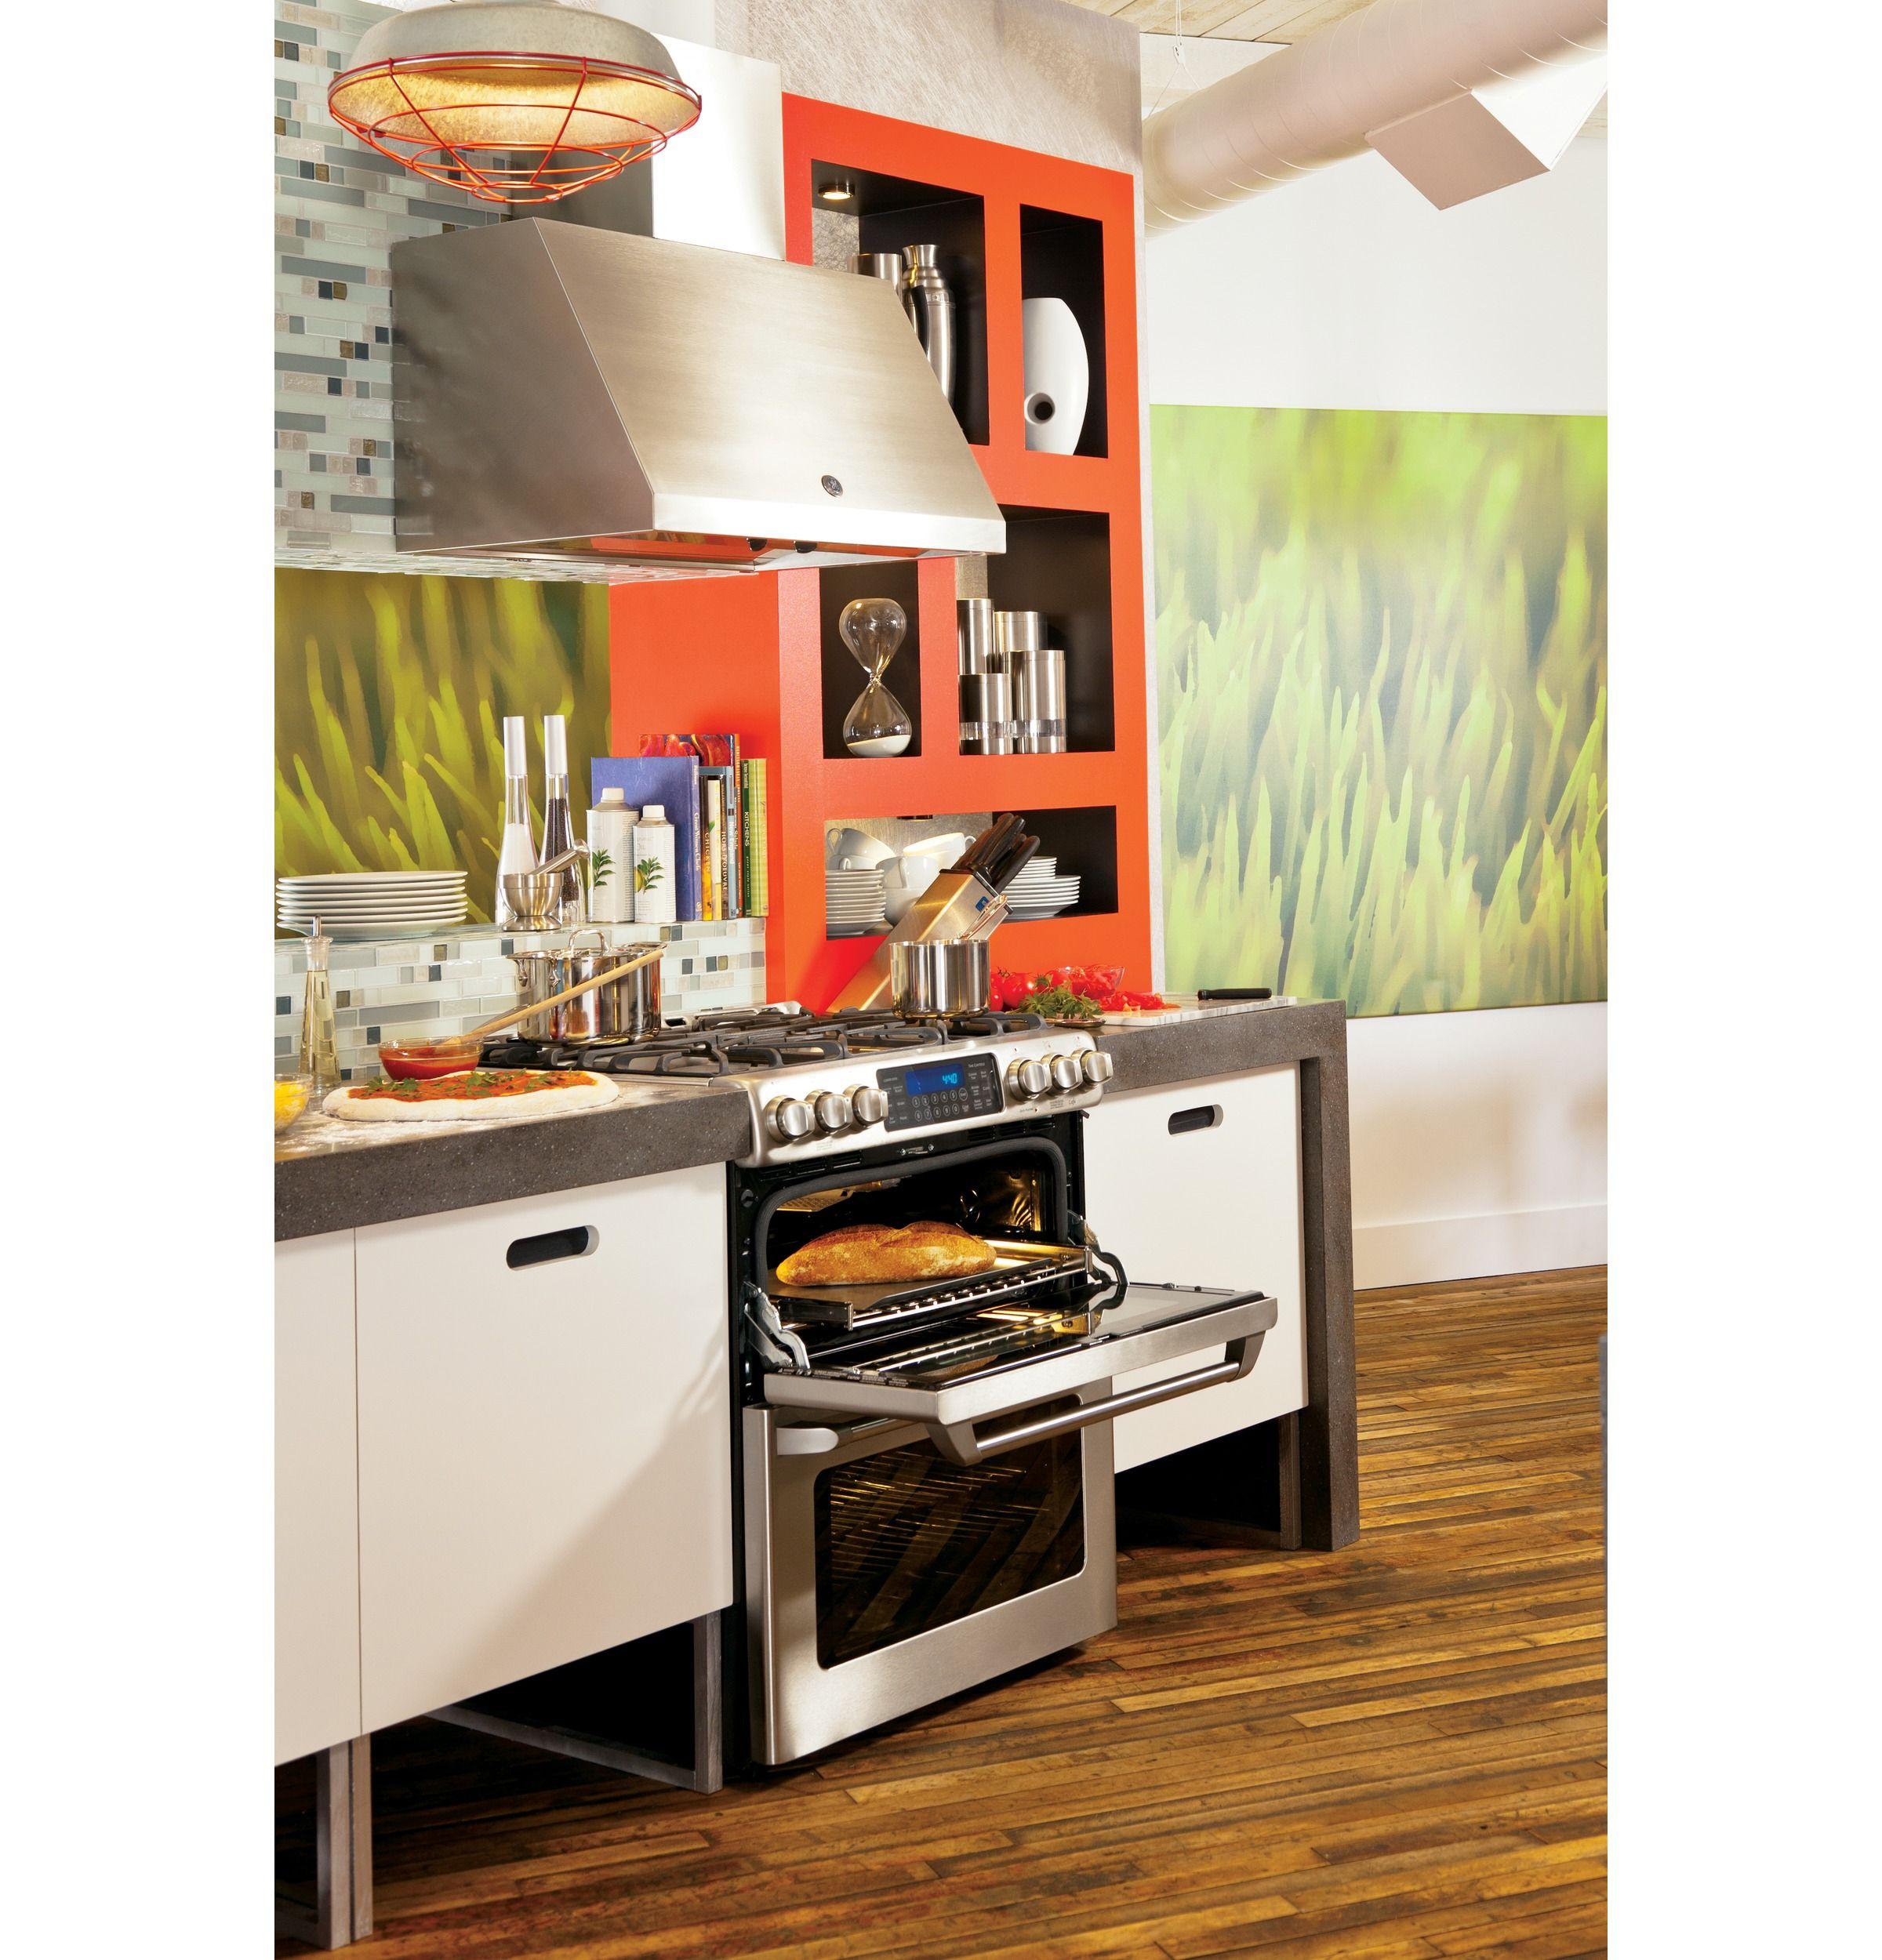 Double Oven Kitchen Design